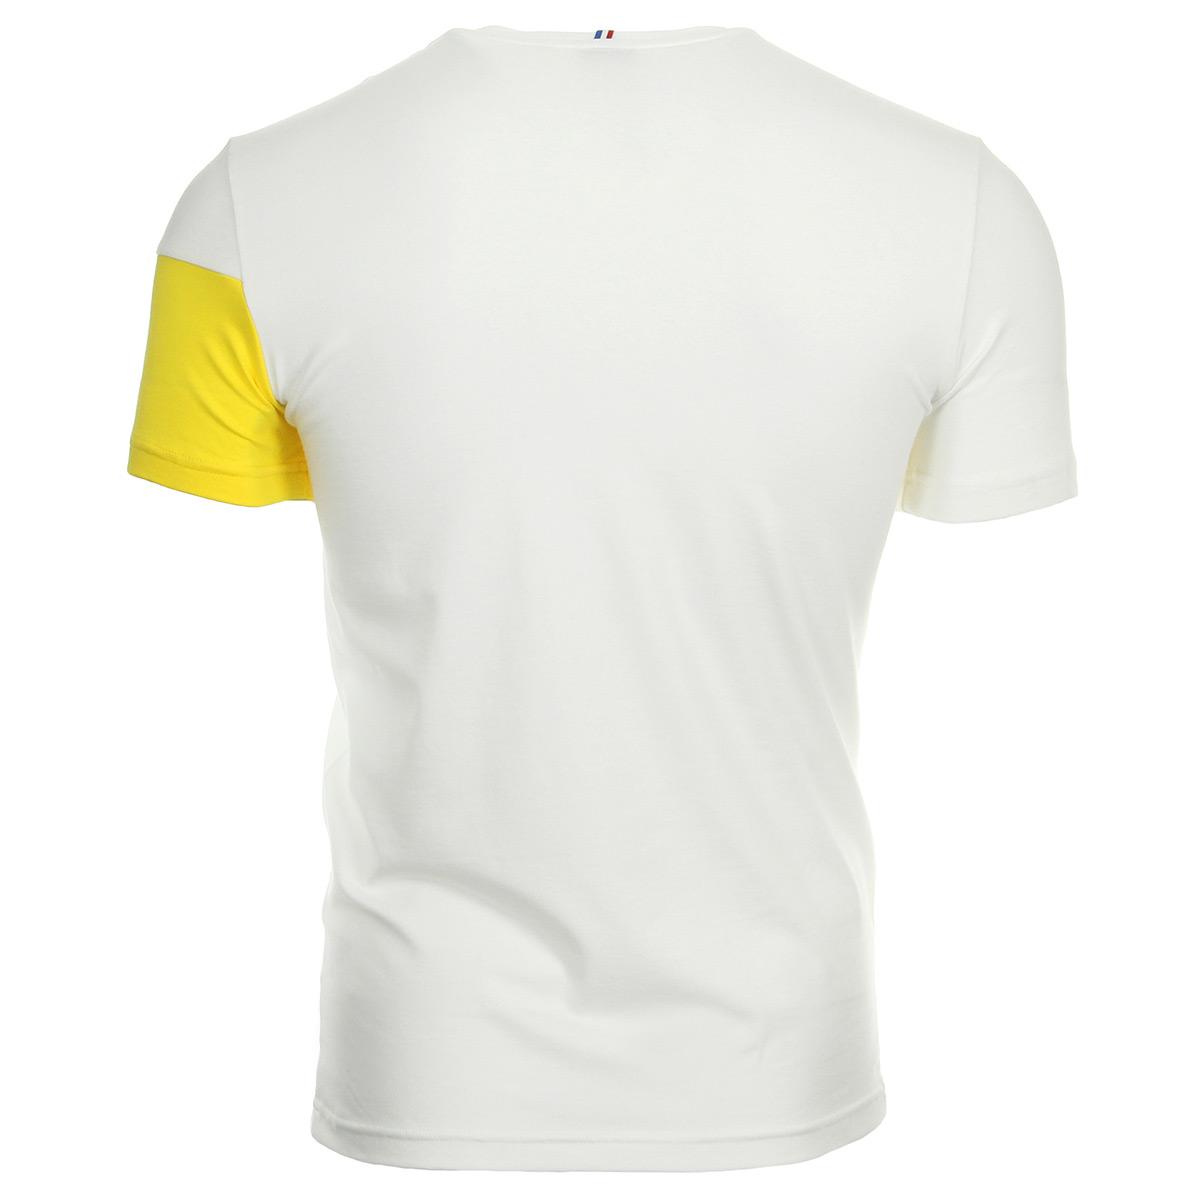 Le Coq Sportif ESS SAISON Tee SS N°1 M new optical whit 1810714, T-Shirts homme